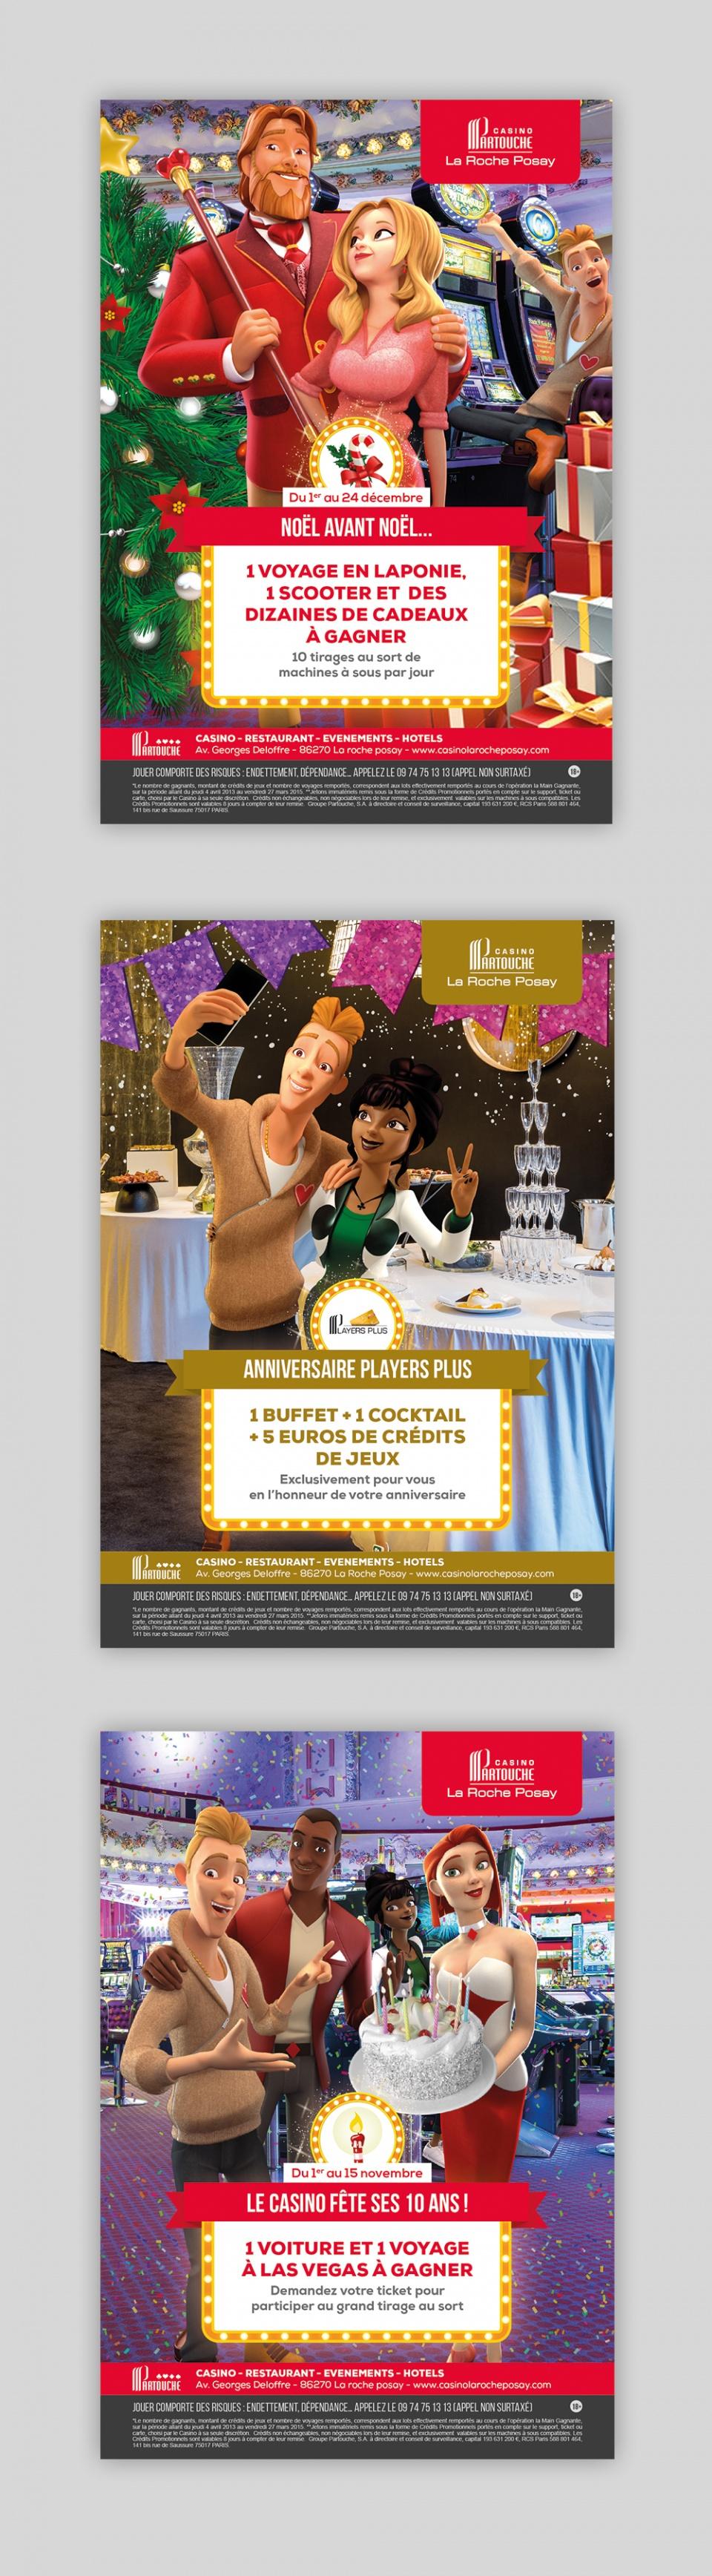 Affiche Casinos PARTOUCHE